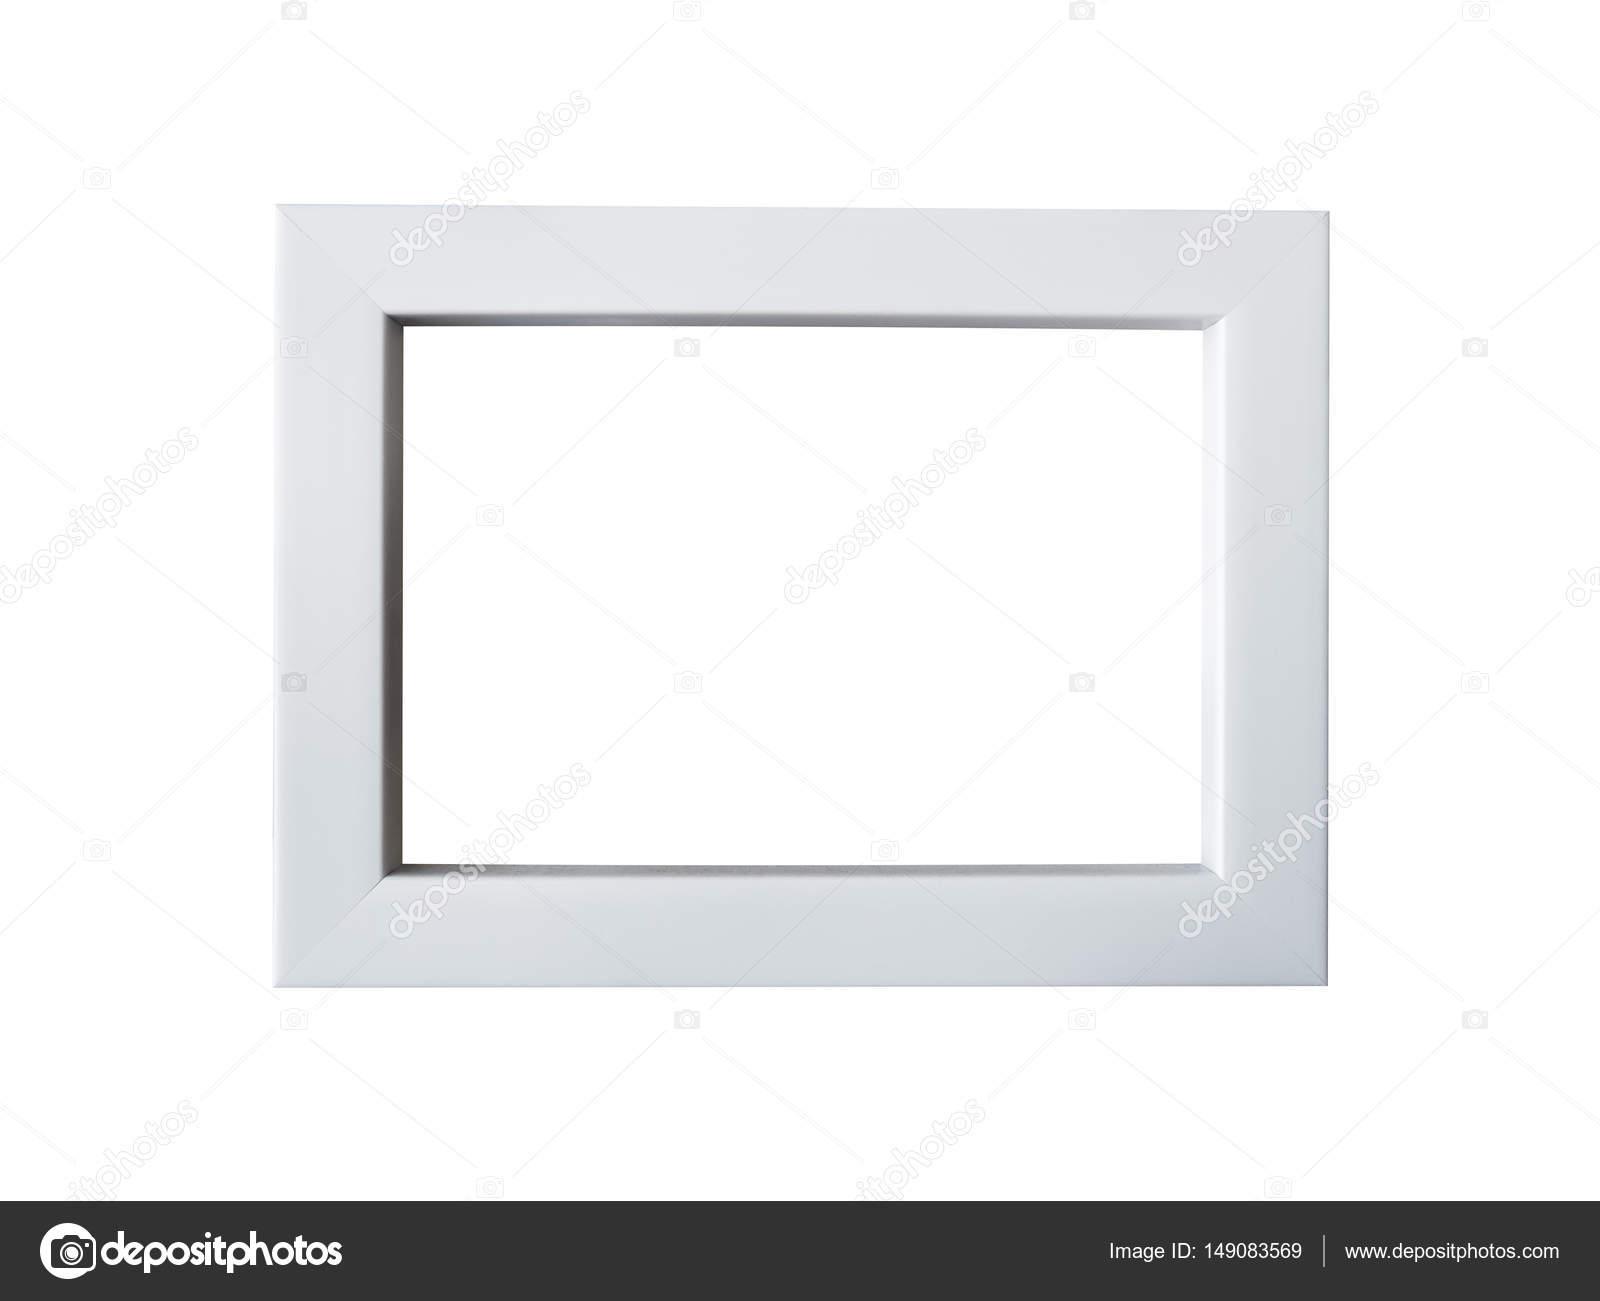 marco de madera blanco sobre fondo blanco — Fotos de Stock ...